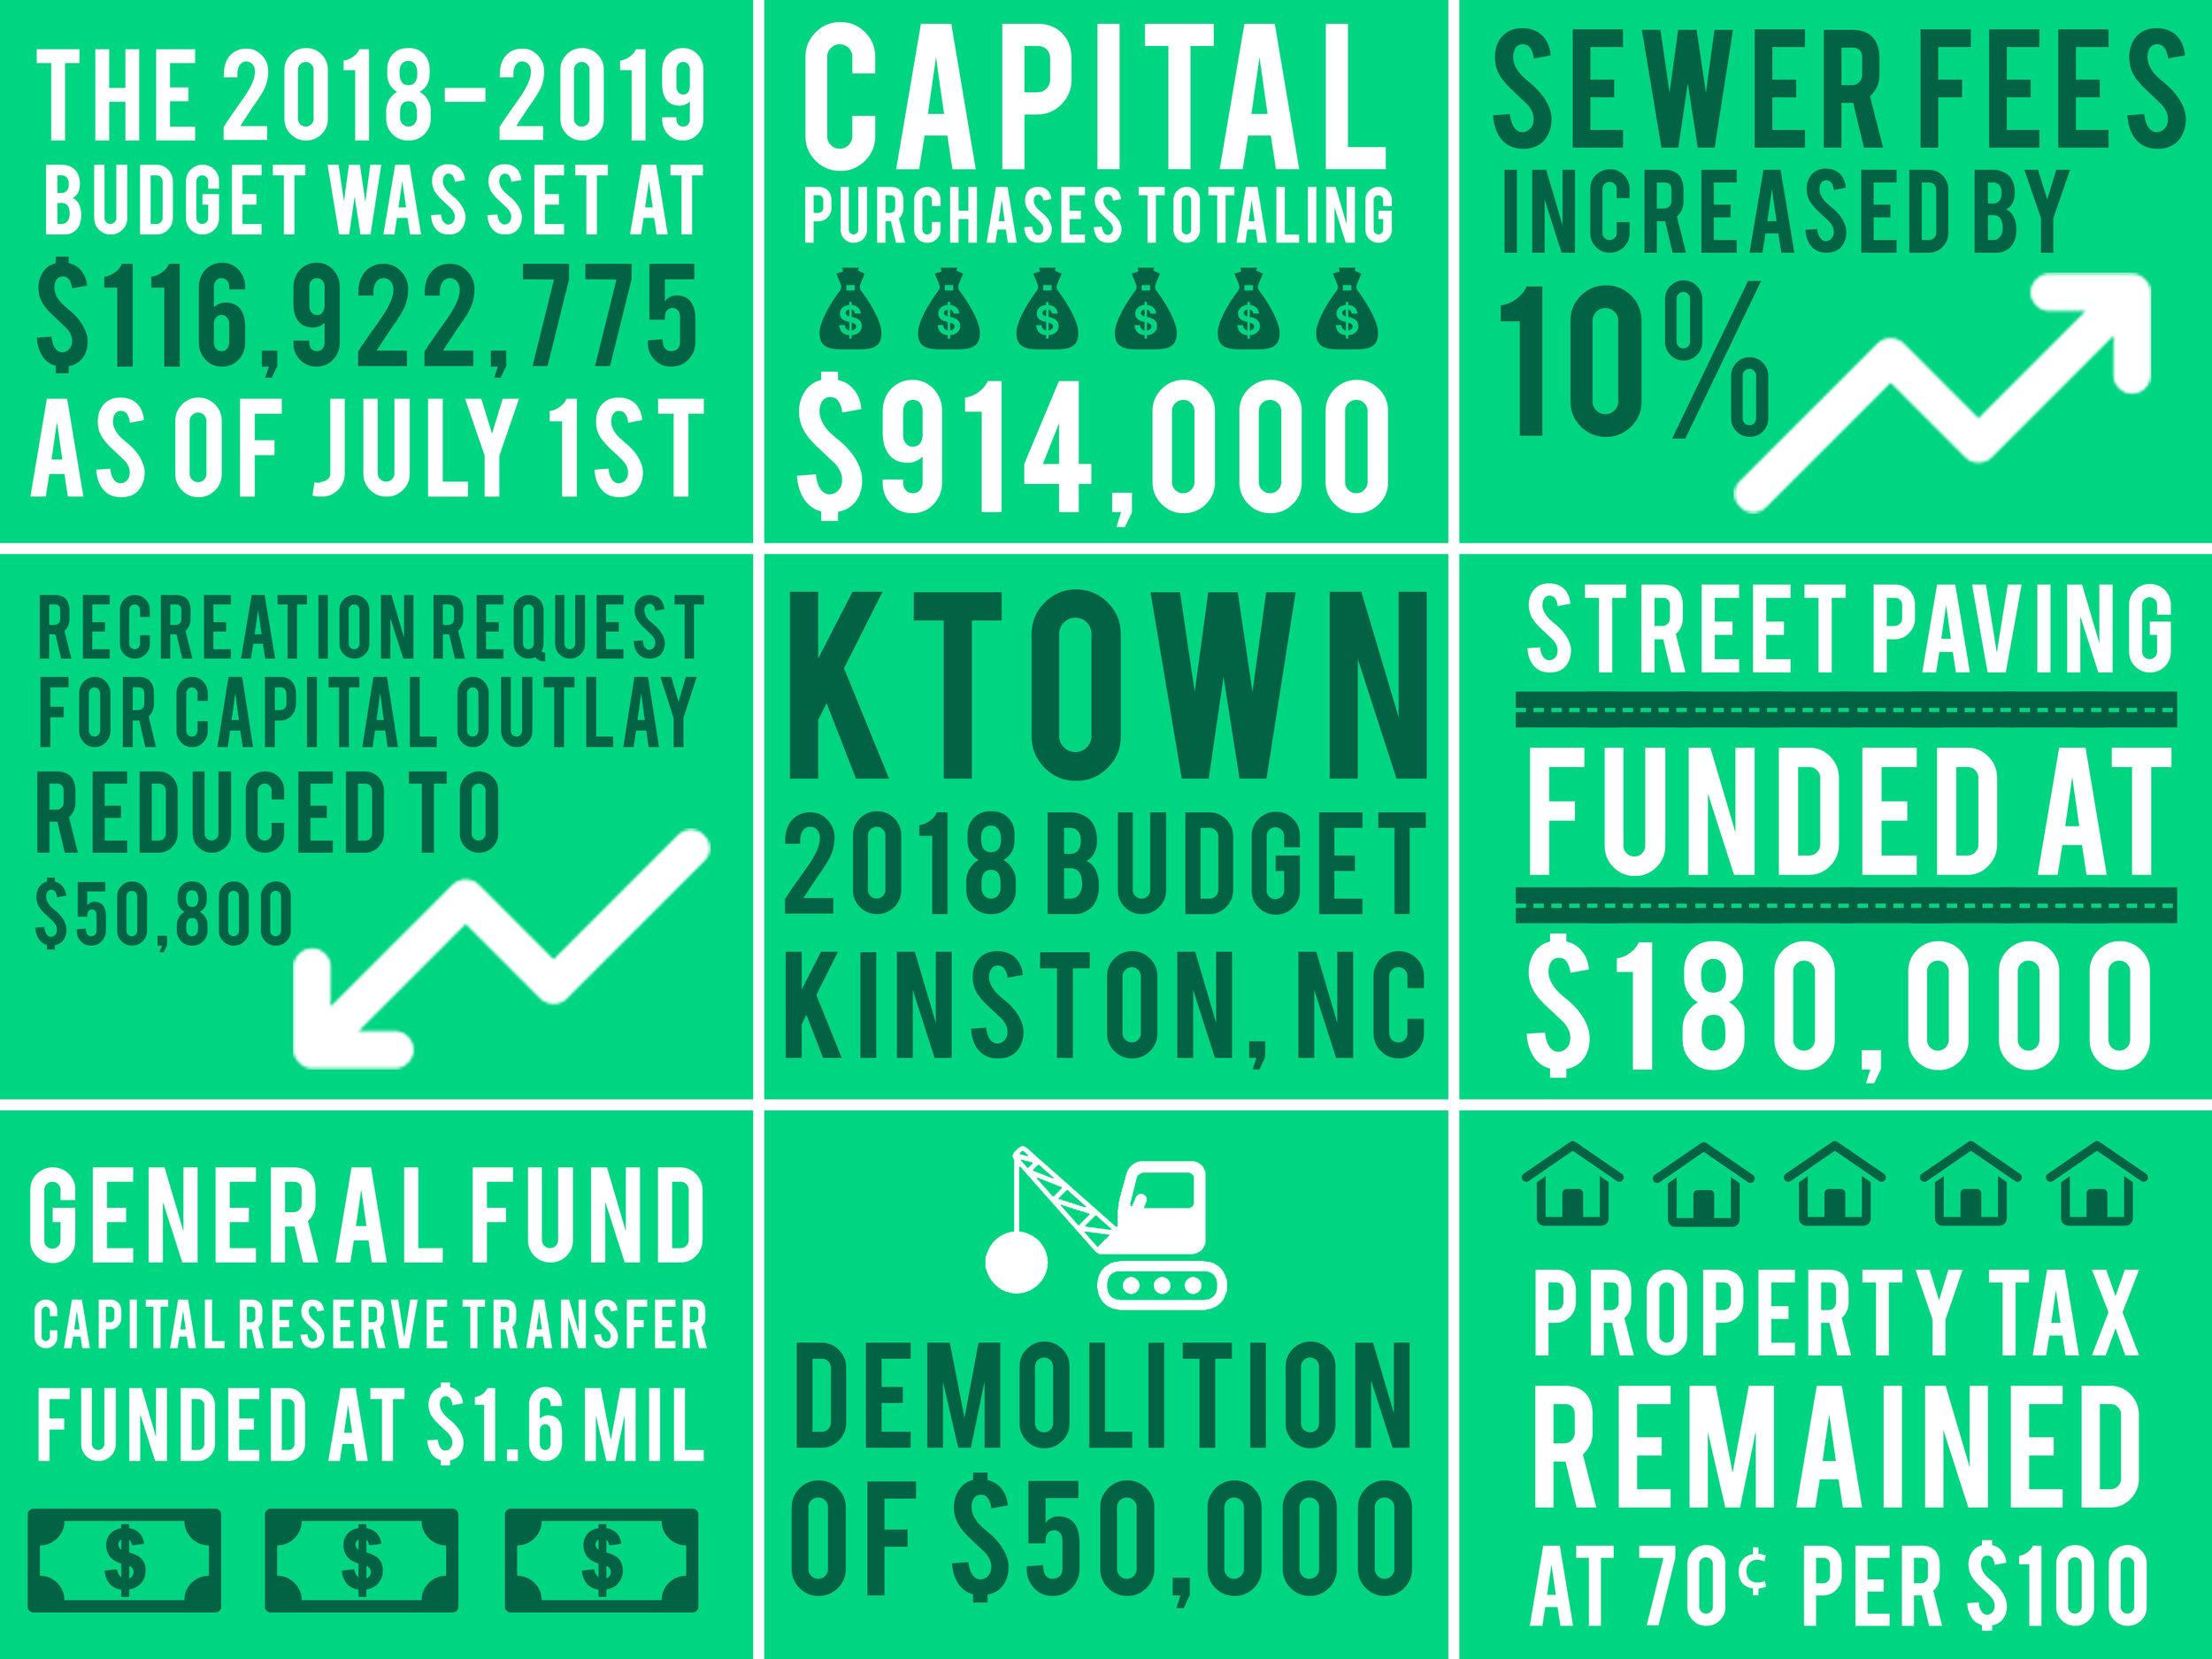 kinston2018-2019-budgetgraphic.jpg